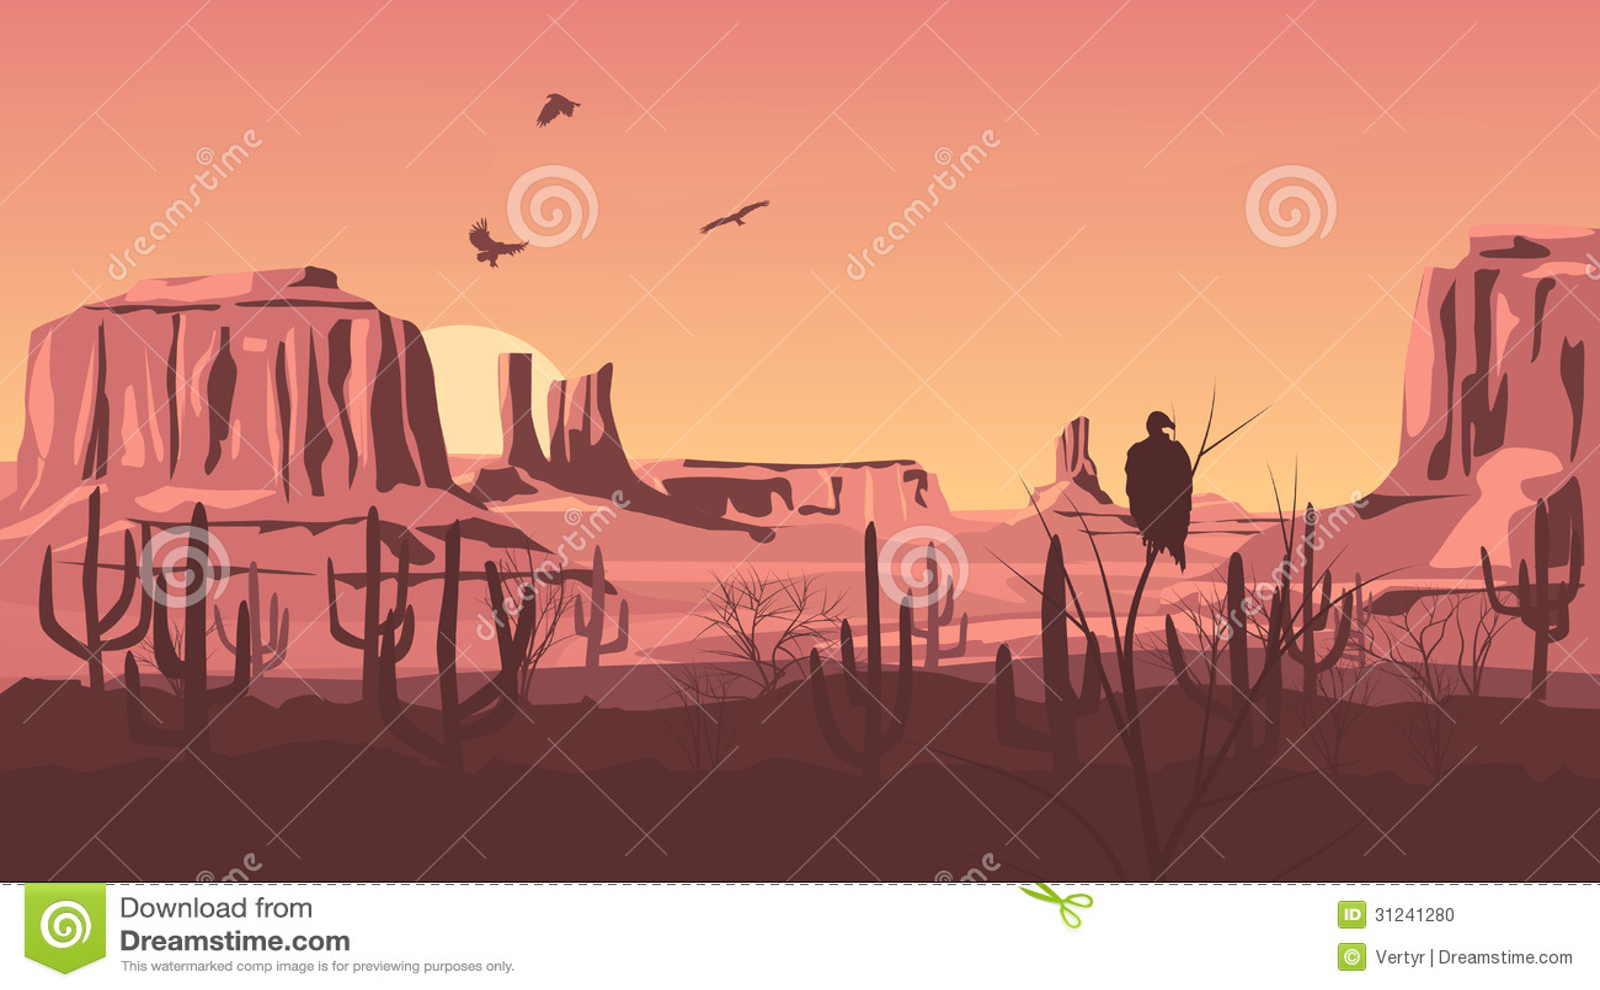 horizontal cartoon illustration of prairie wild west with cacti at